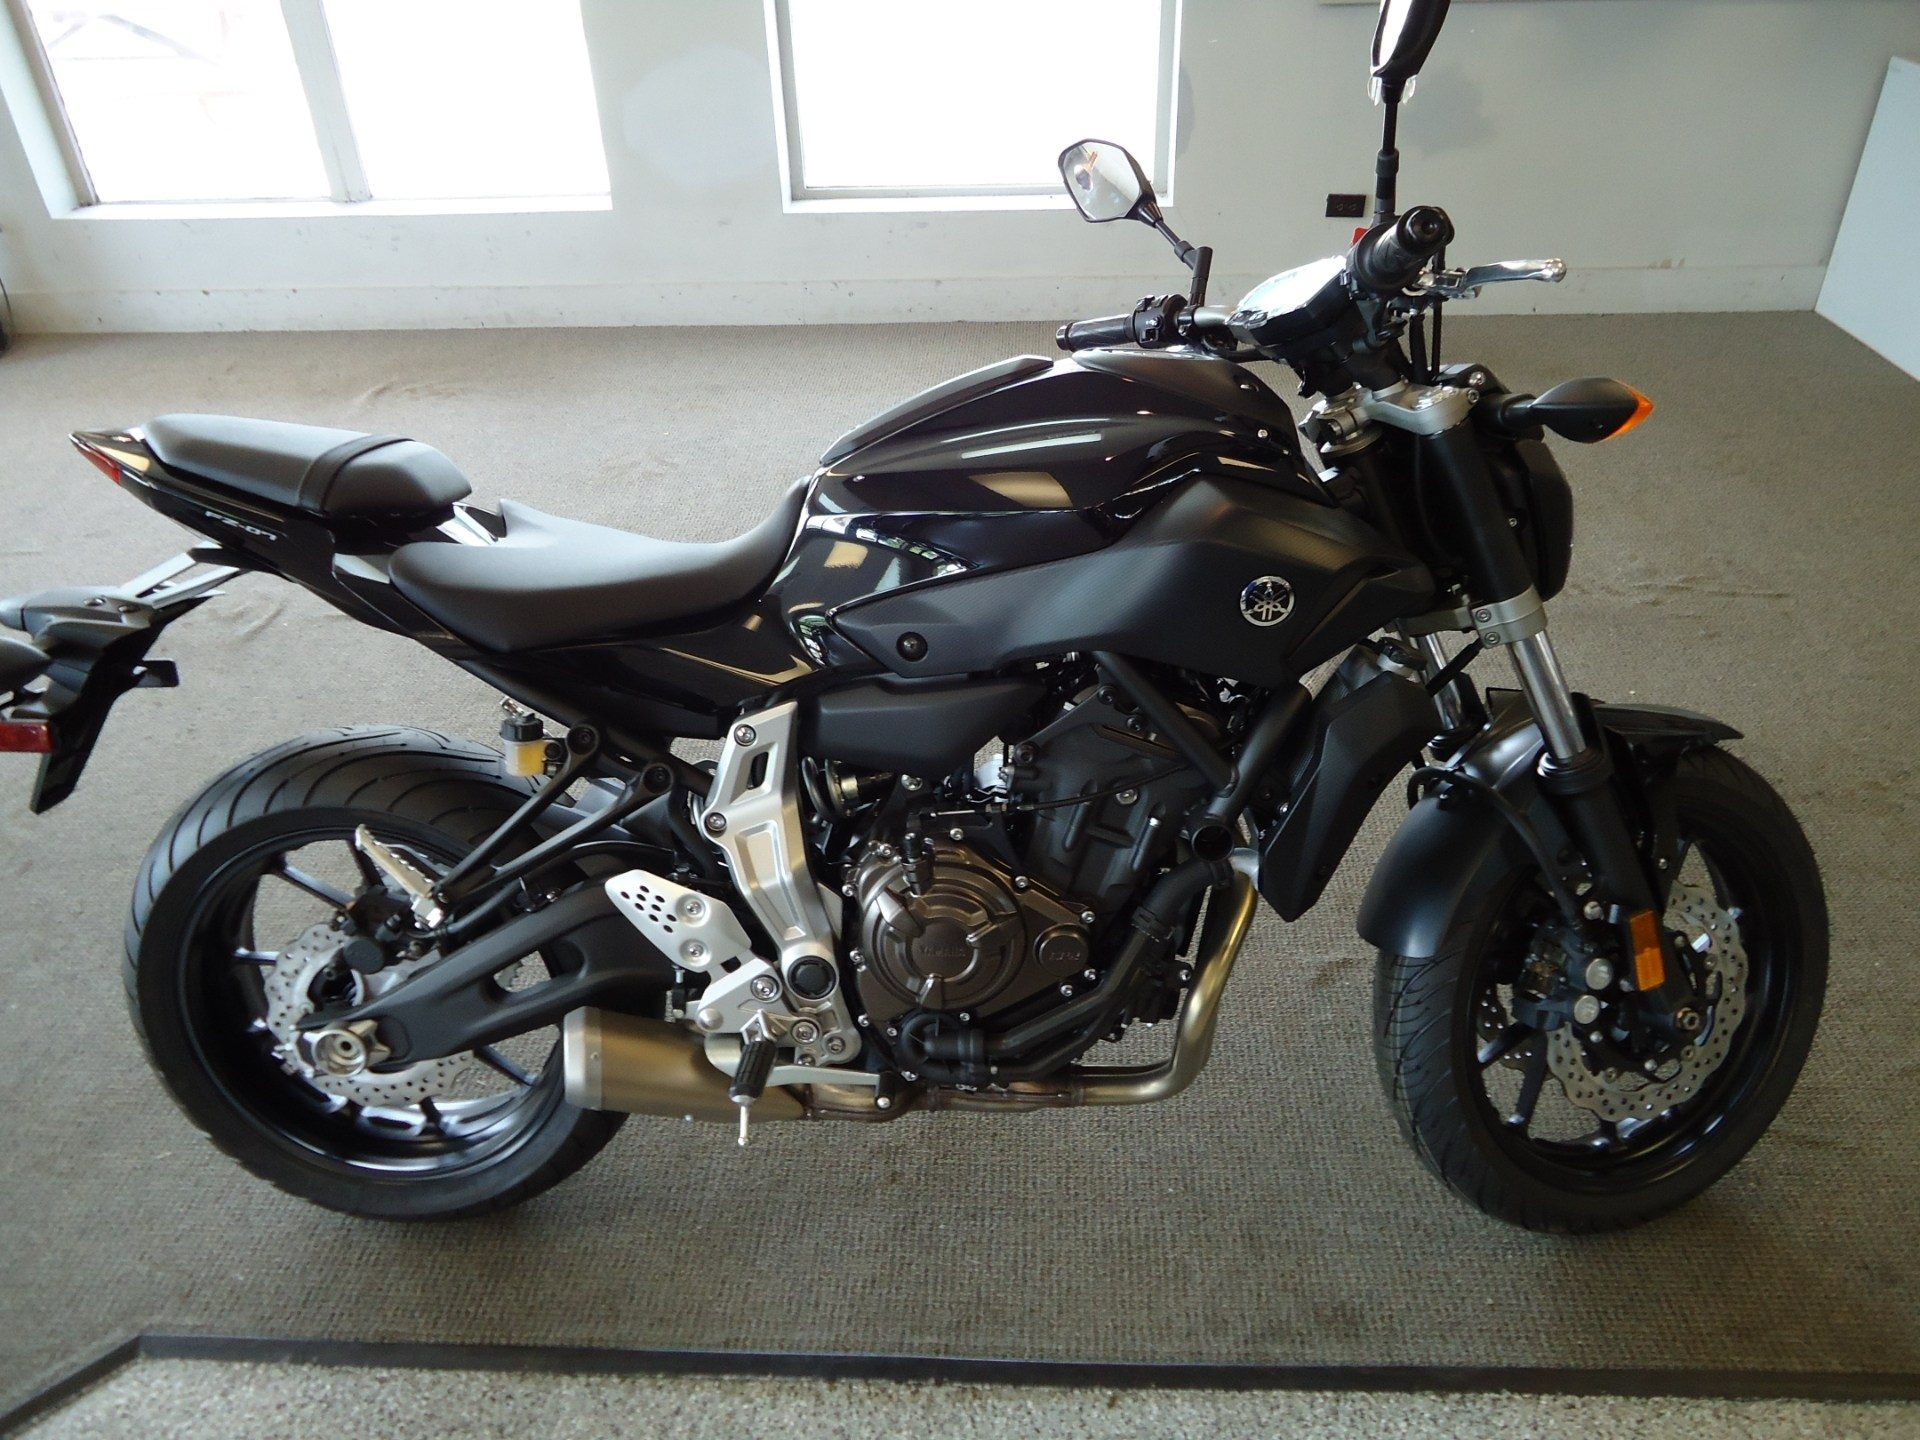 2016 Yamaha FZ-07 for sale 78846